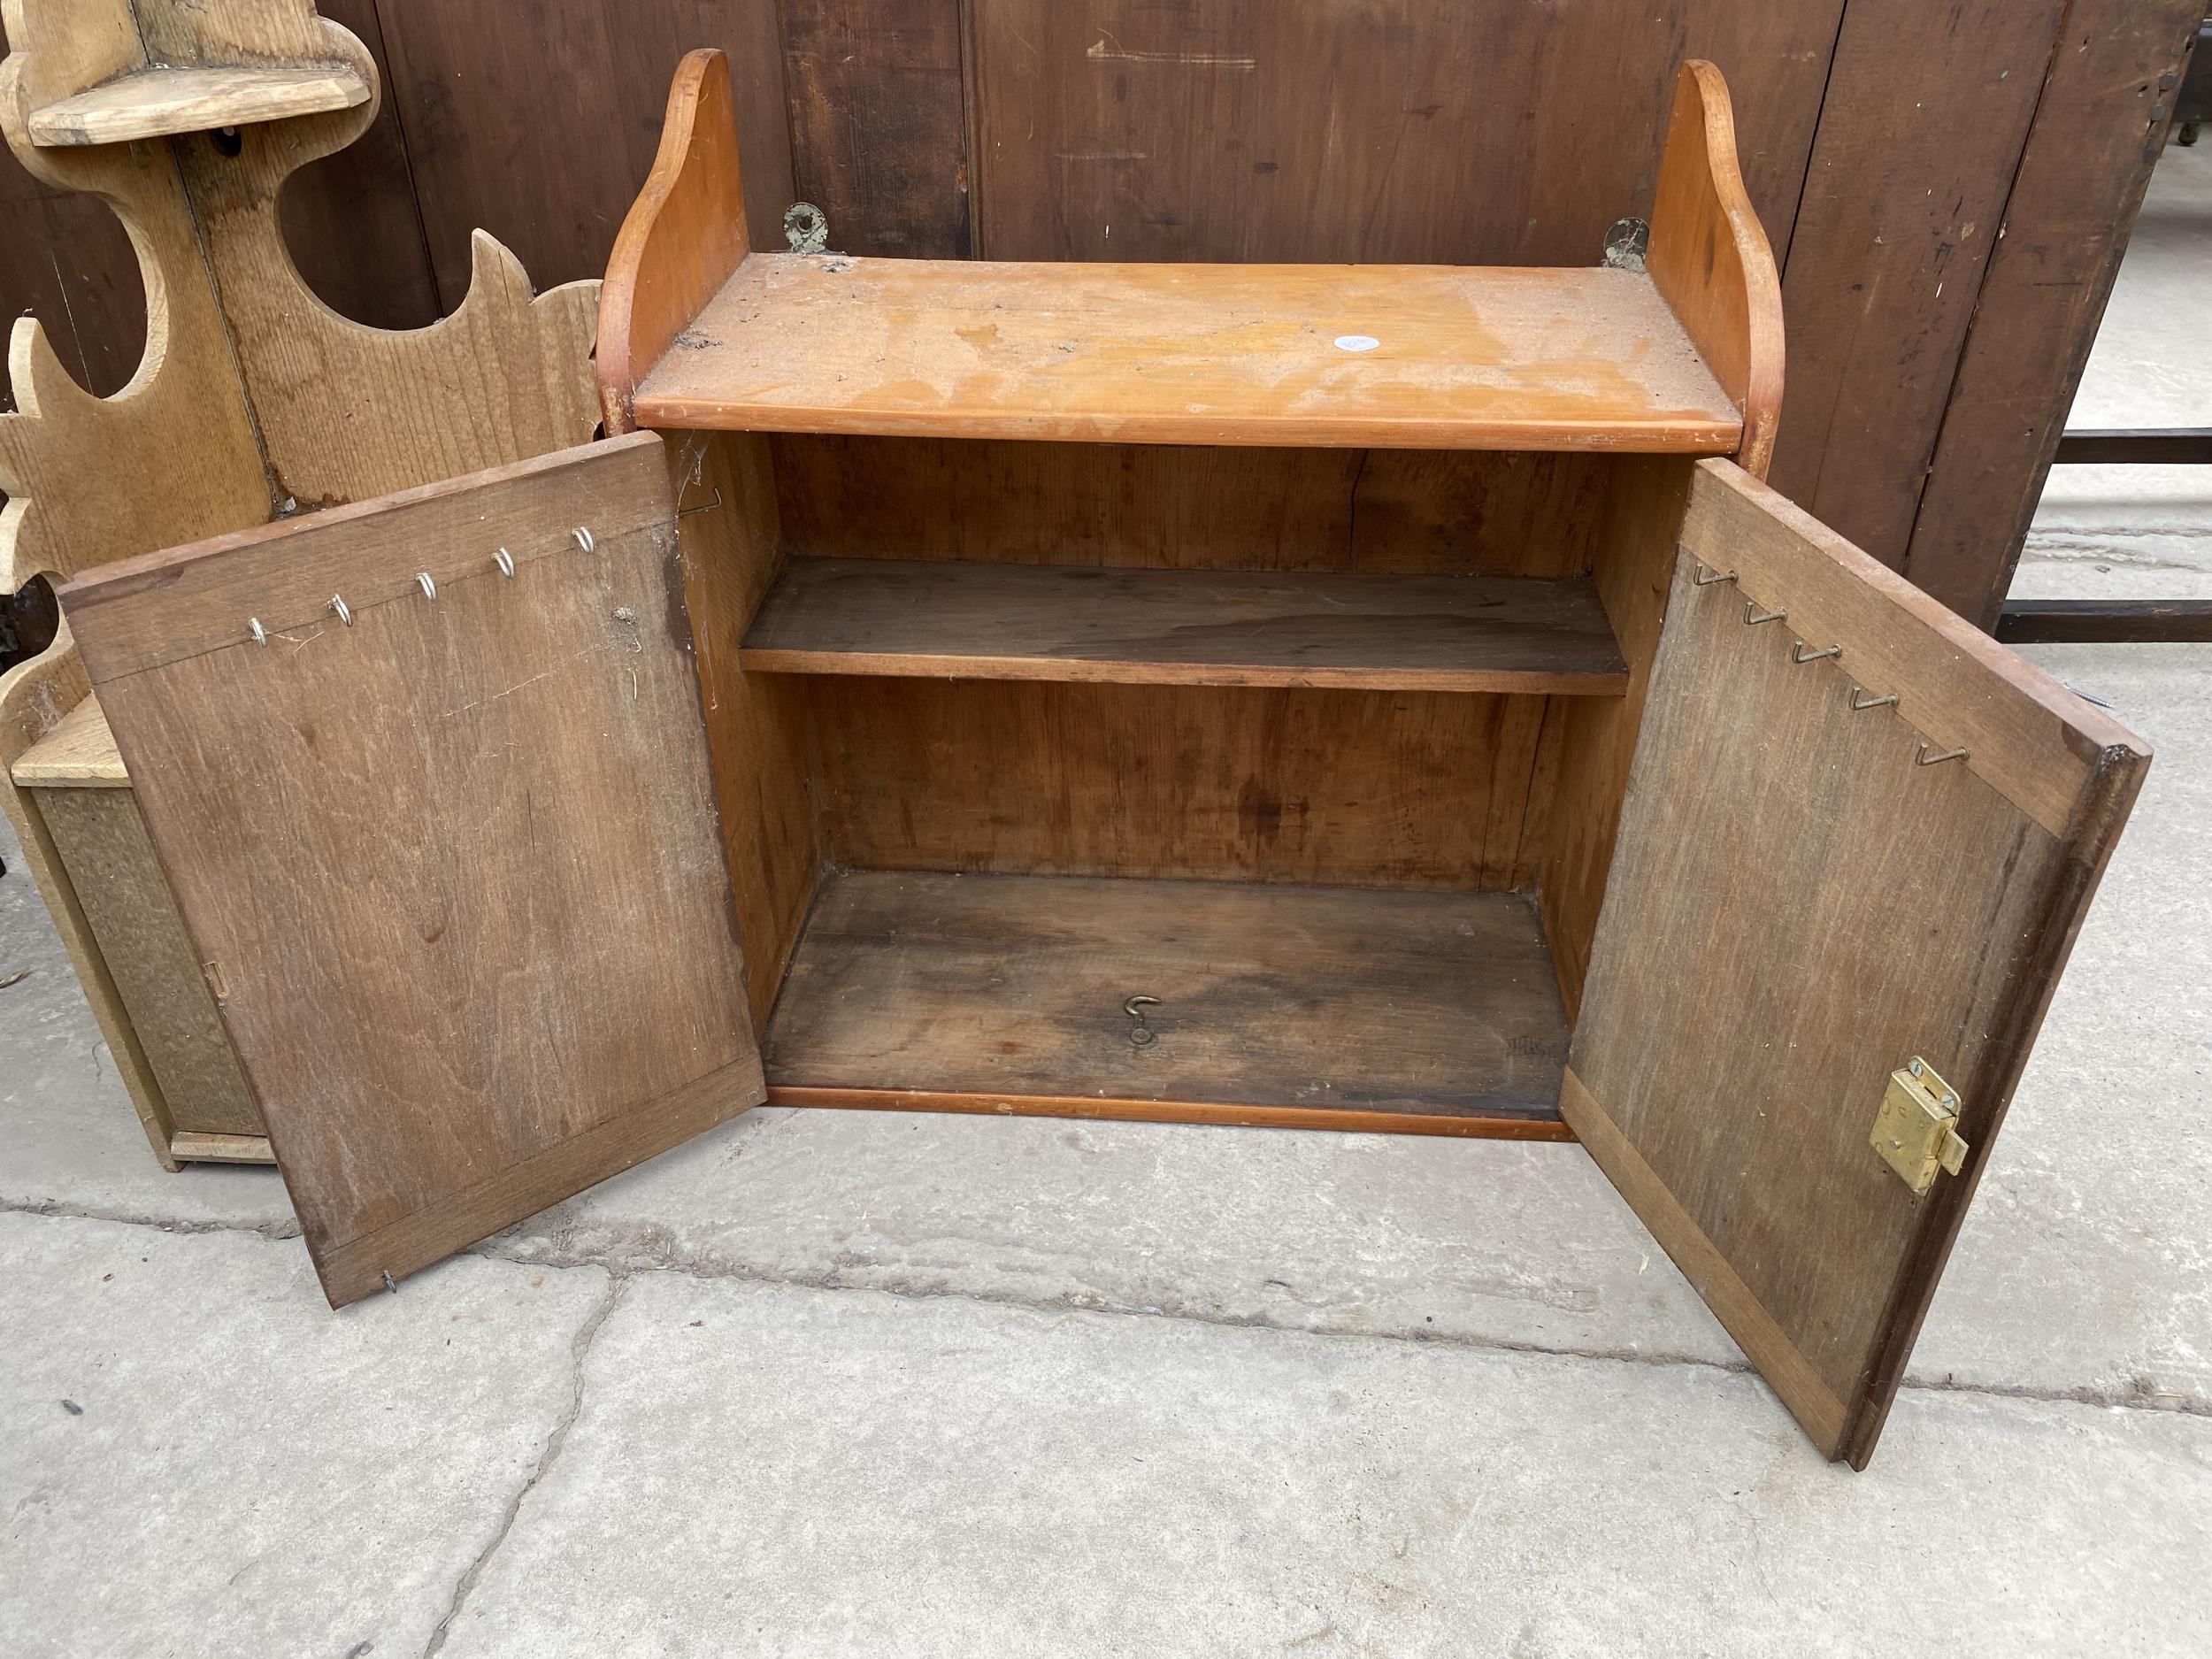 A PINE CORNER SHELF AND TWO DOOR WALL CUPBOARD - Image 3 of 3